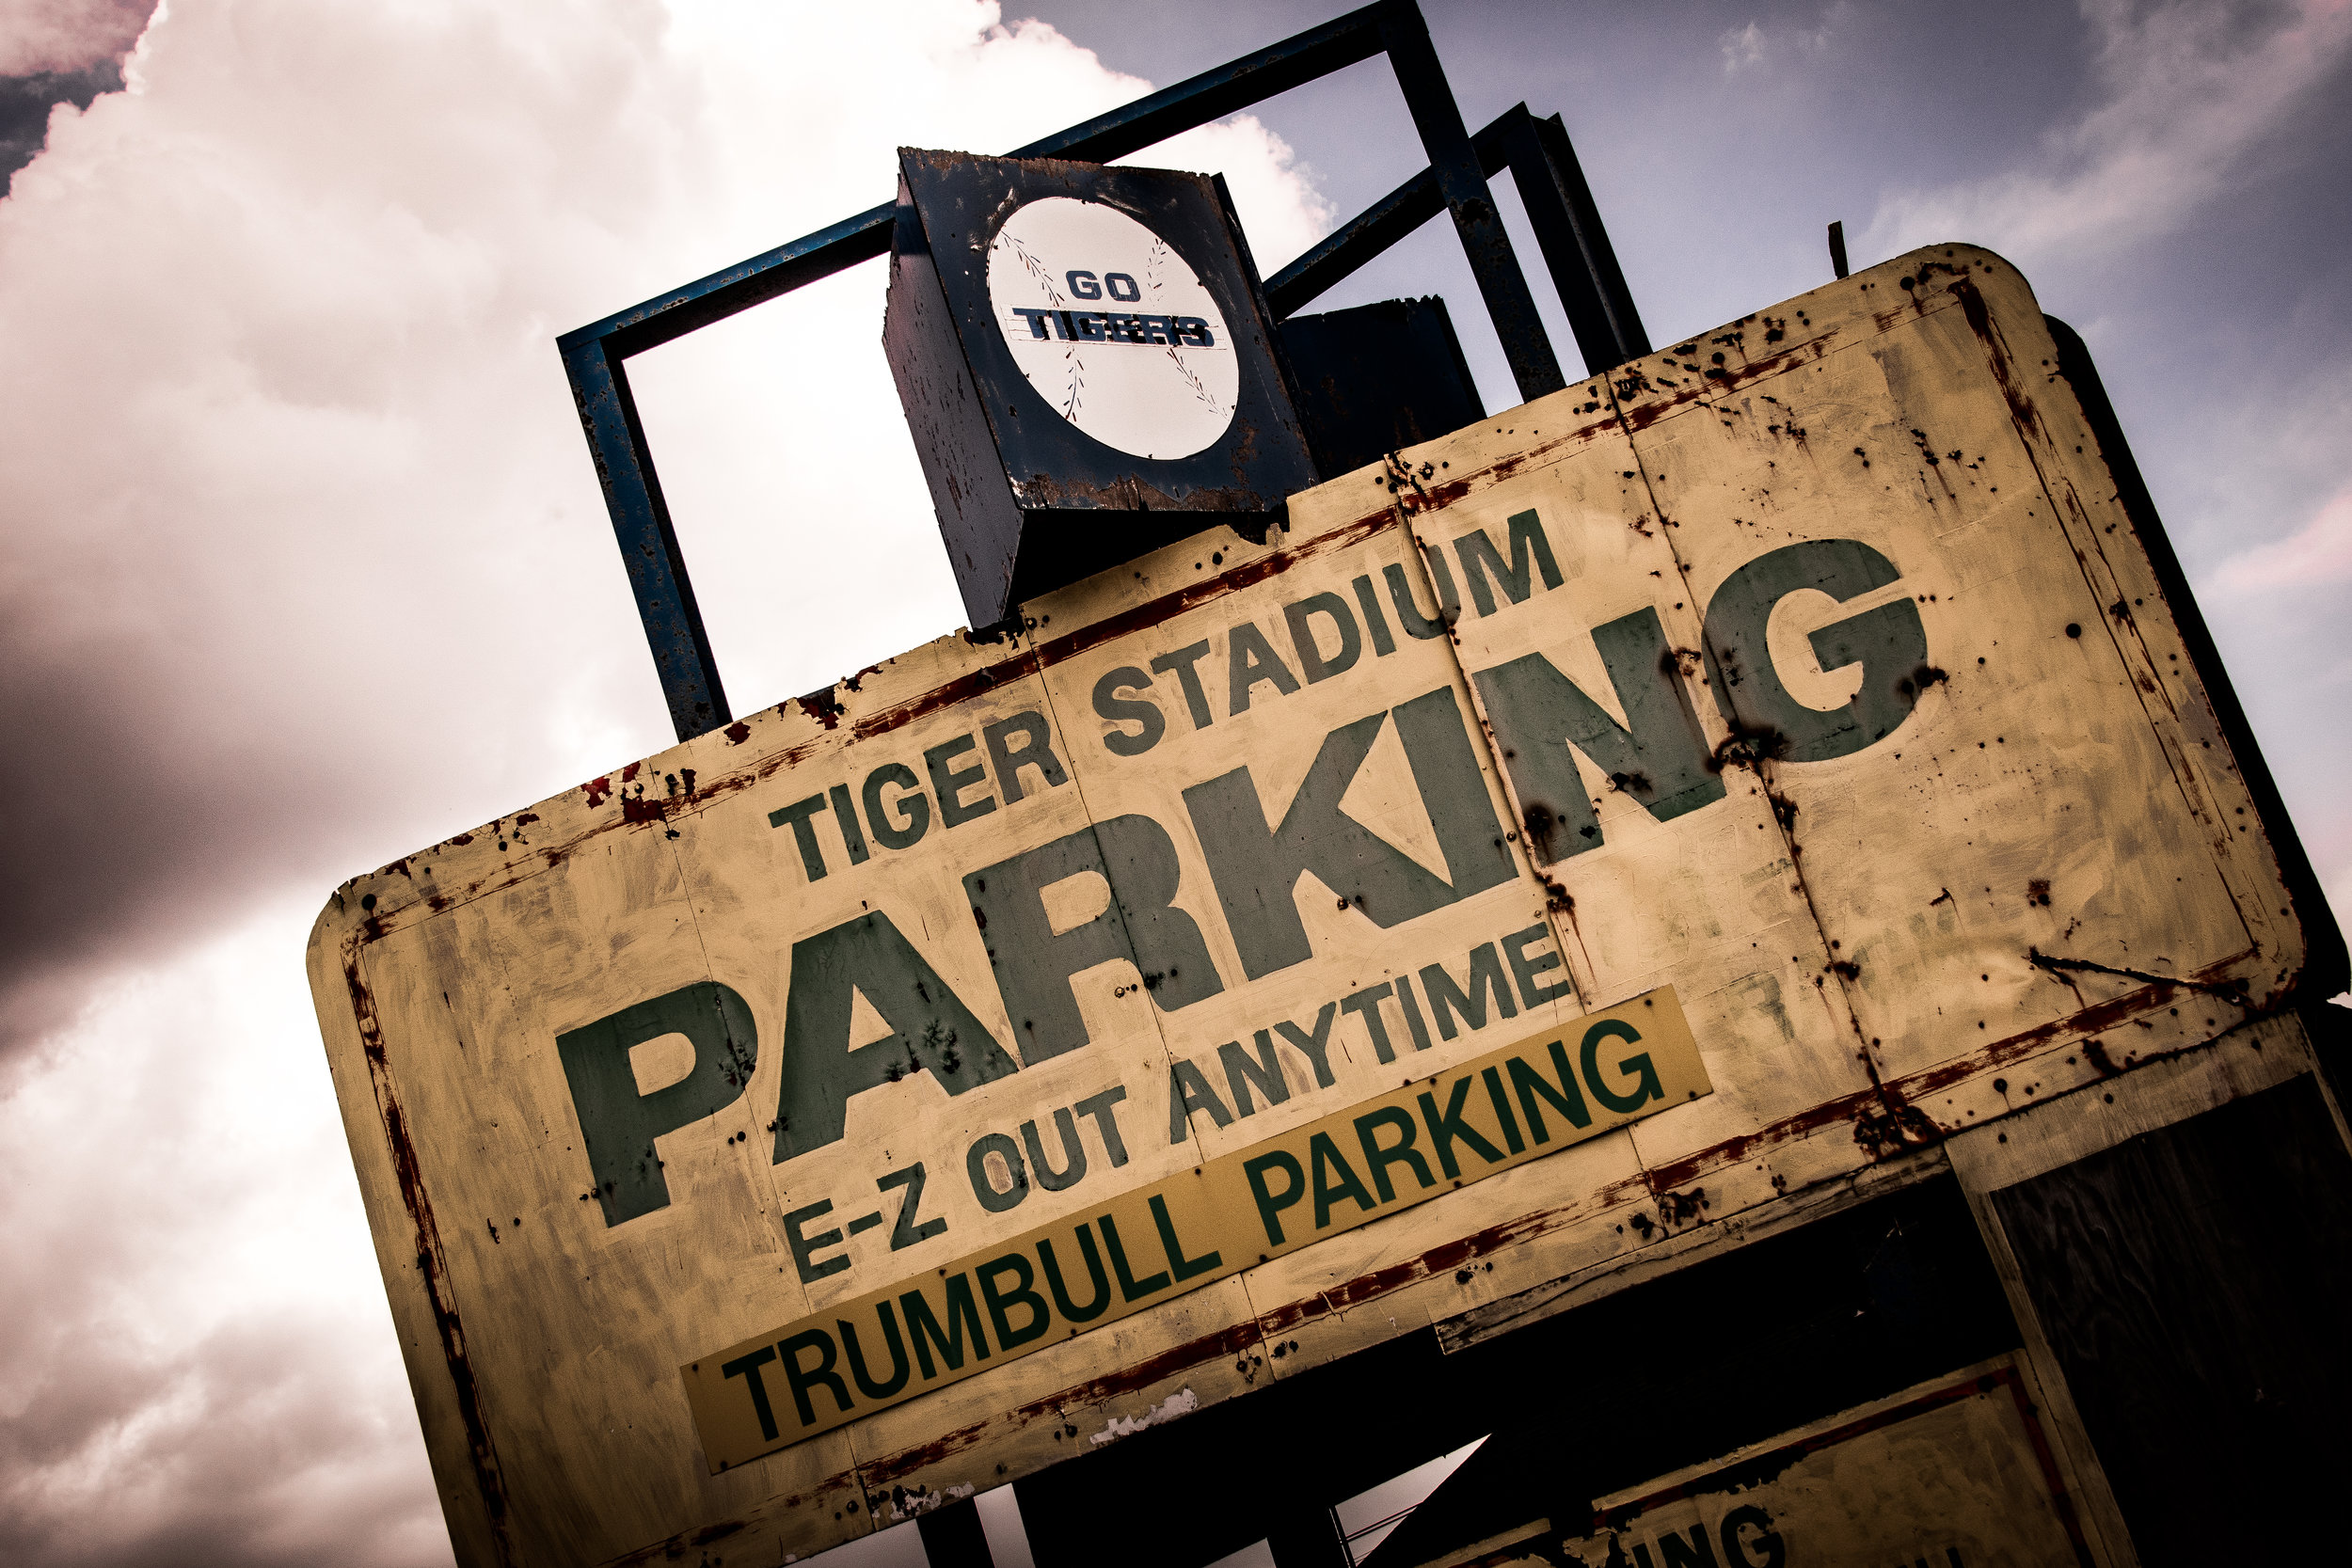 Tiger Stadium Parking Sign